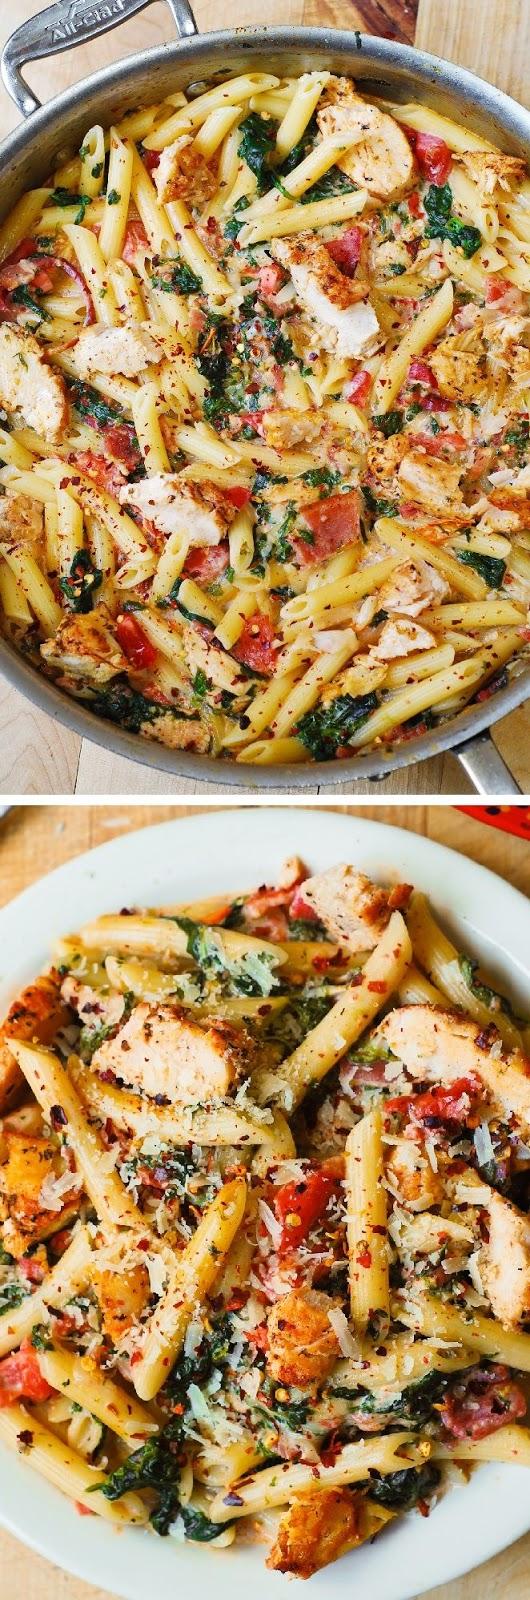 Penne Chicken Zitti Recipes